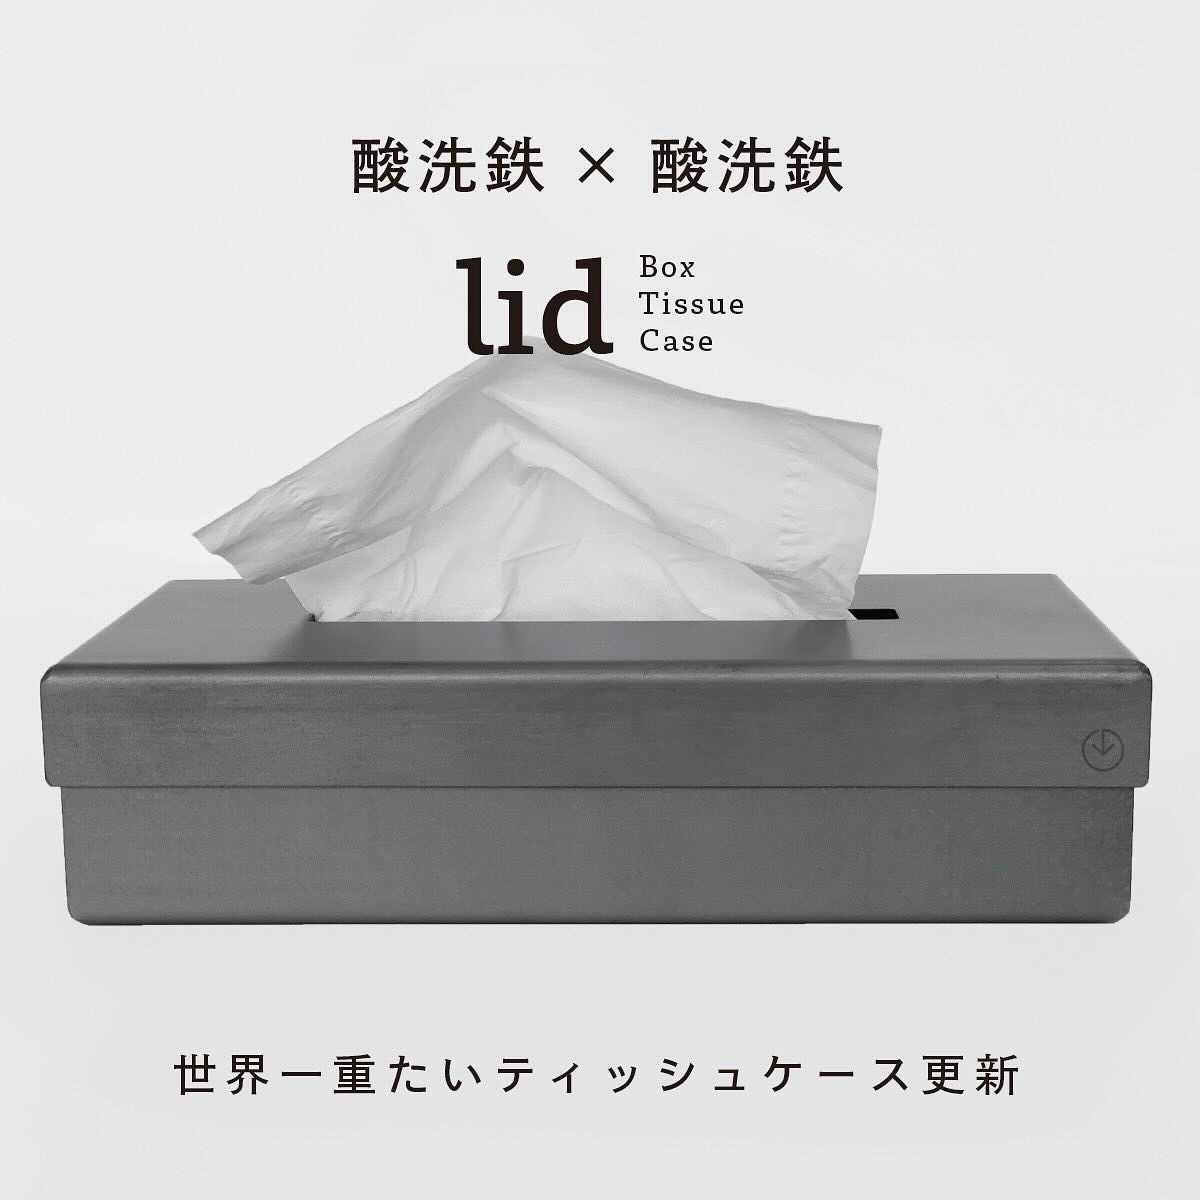 GRAVIRoN lid Box Tissue Case 酸洗鉄×酸洗鉄(ティッシュケース)